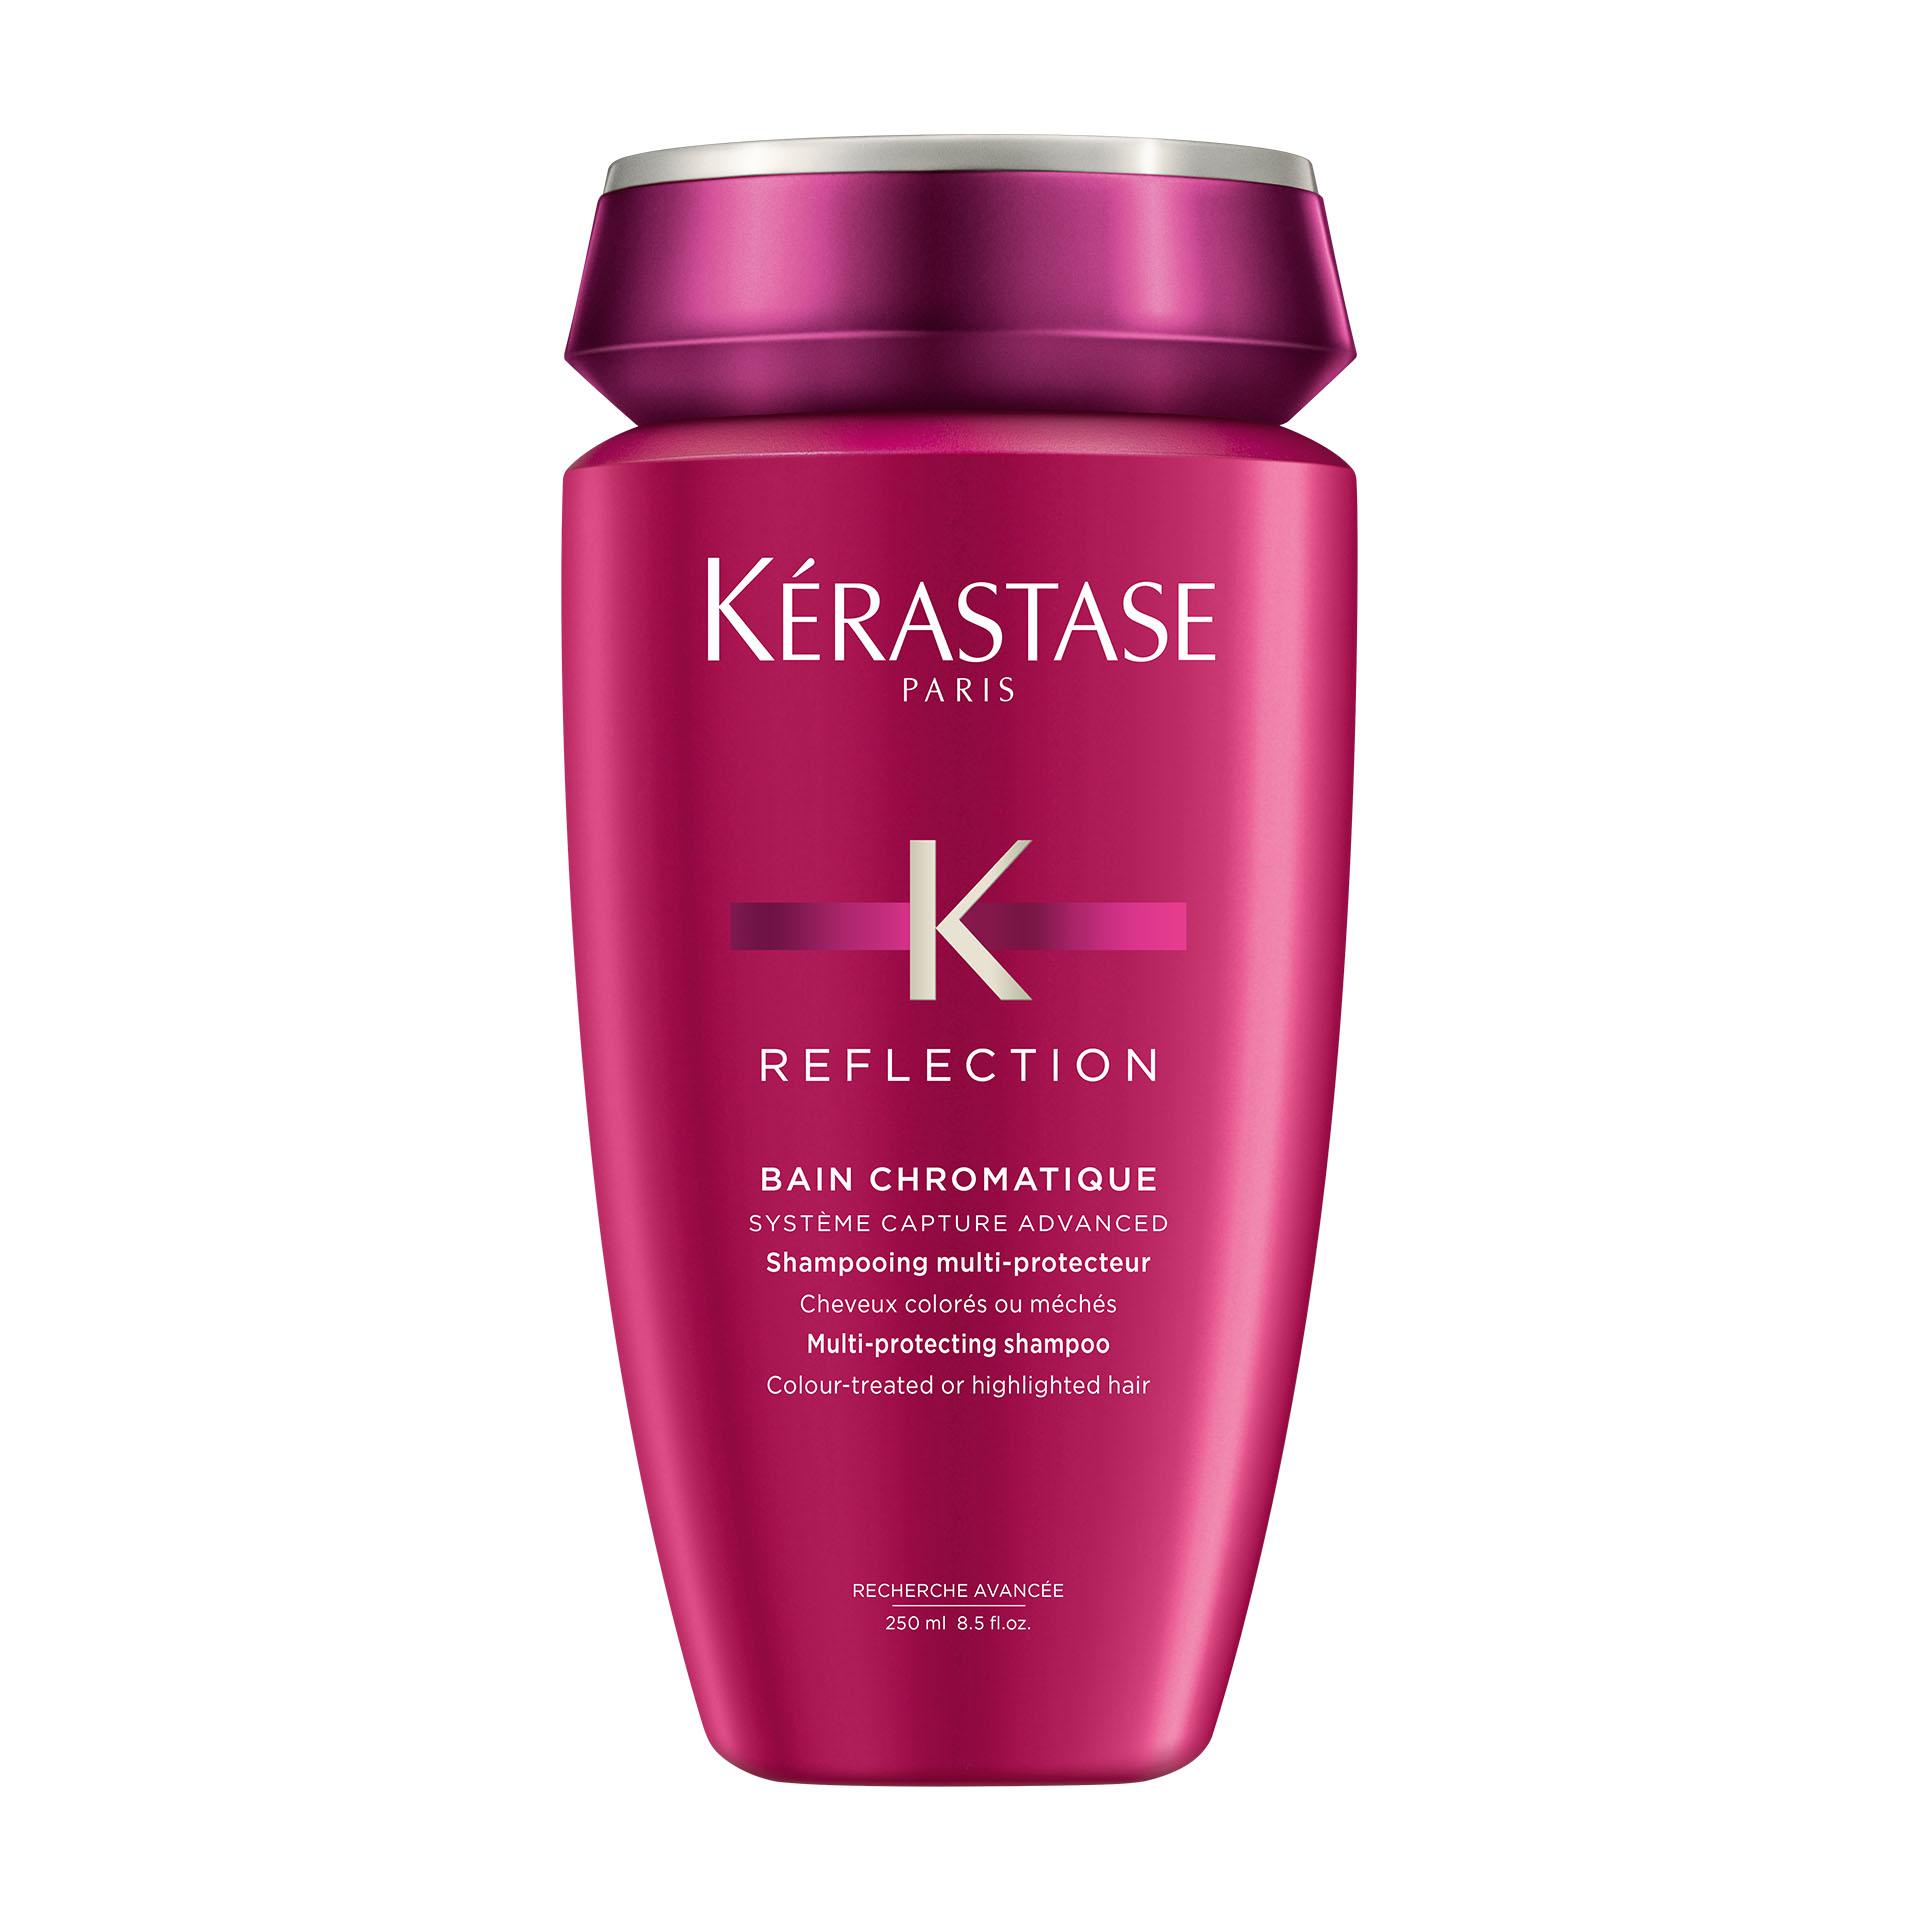 KERASTASE Шампунь-ванна для защиты цвета окрашенных волос Хроматик / РЕФЛЕКСЬОН 250мл kerastase kerastase маска для защиты цвета тонких окрашенных волос reflection chromatique e2269700 500 мл